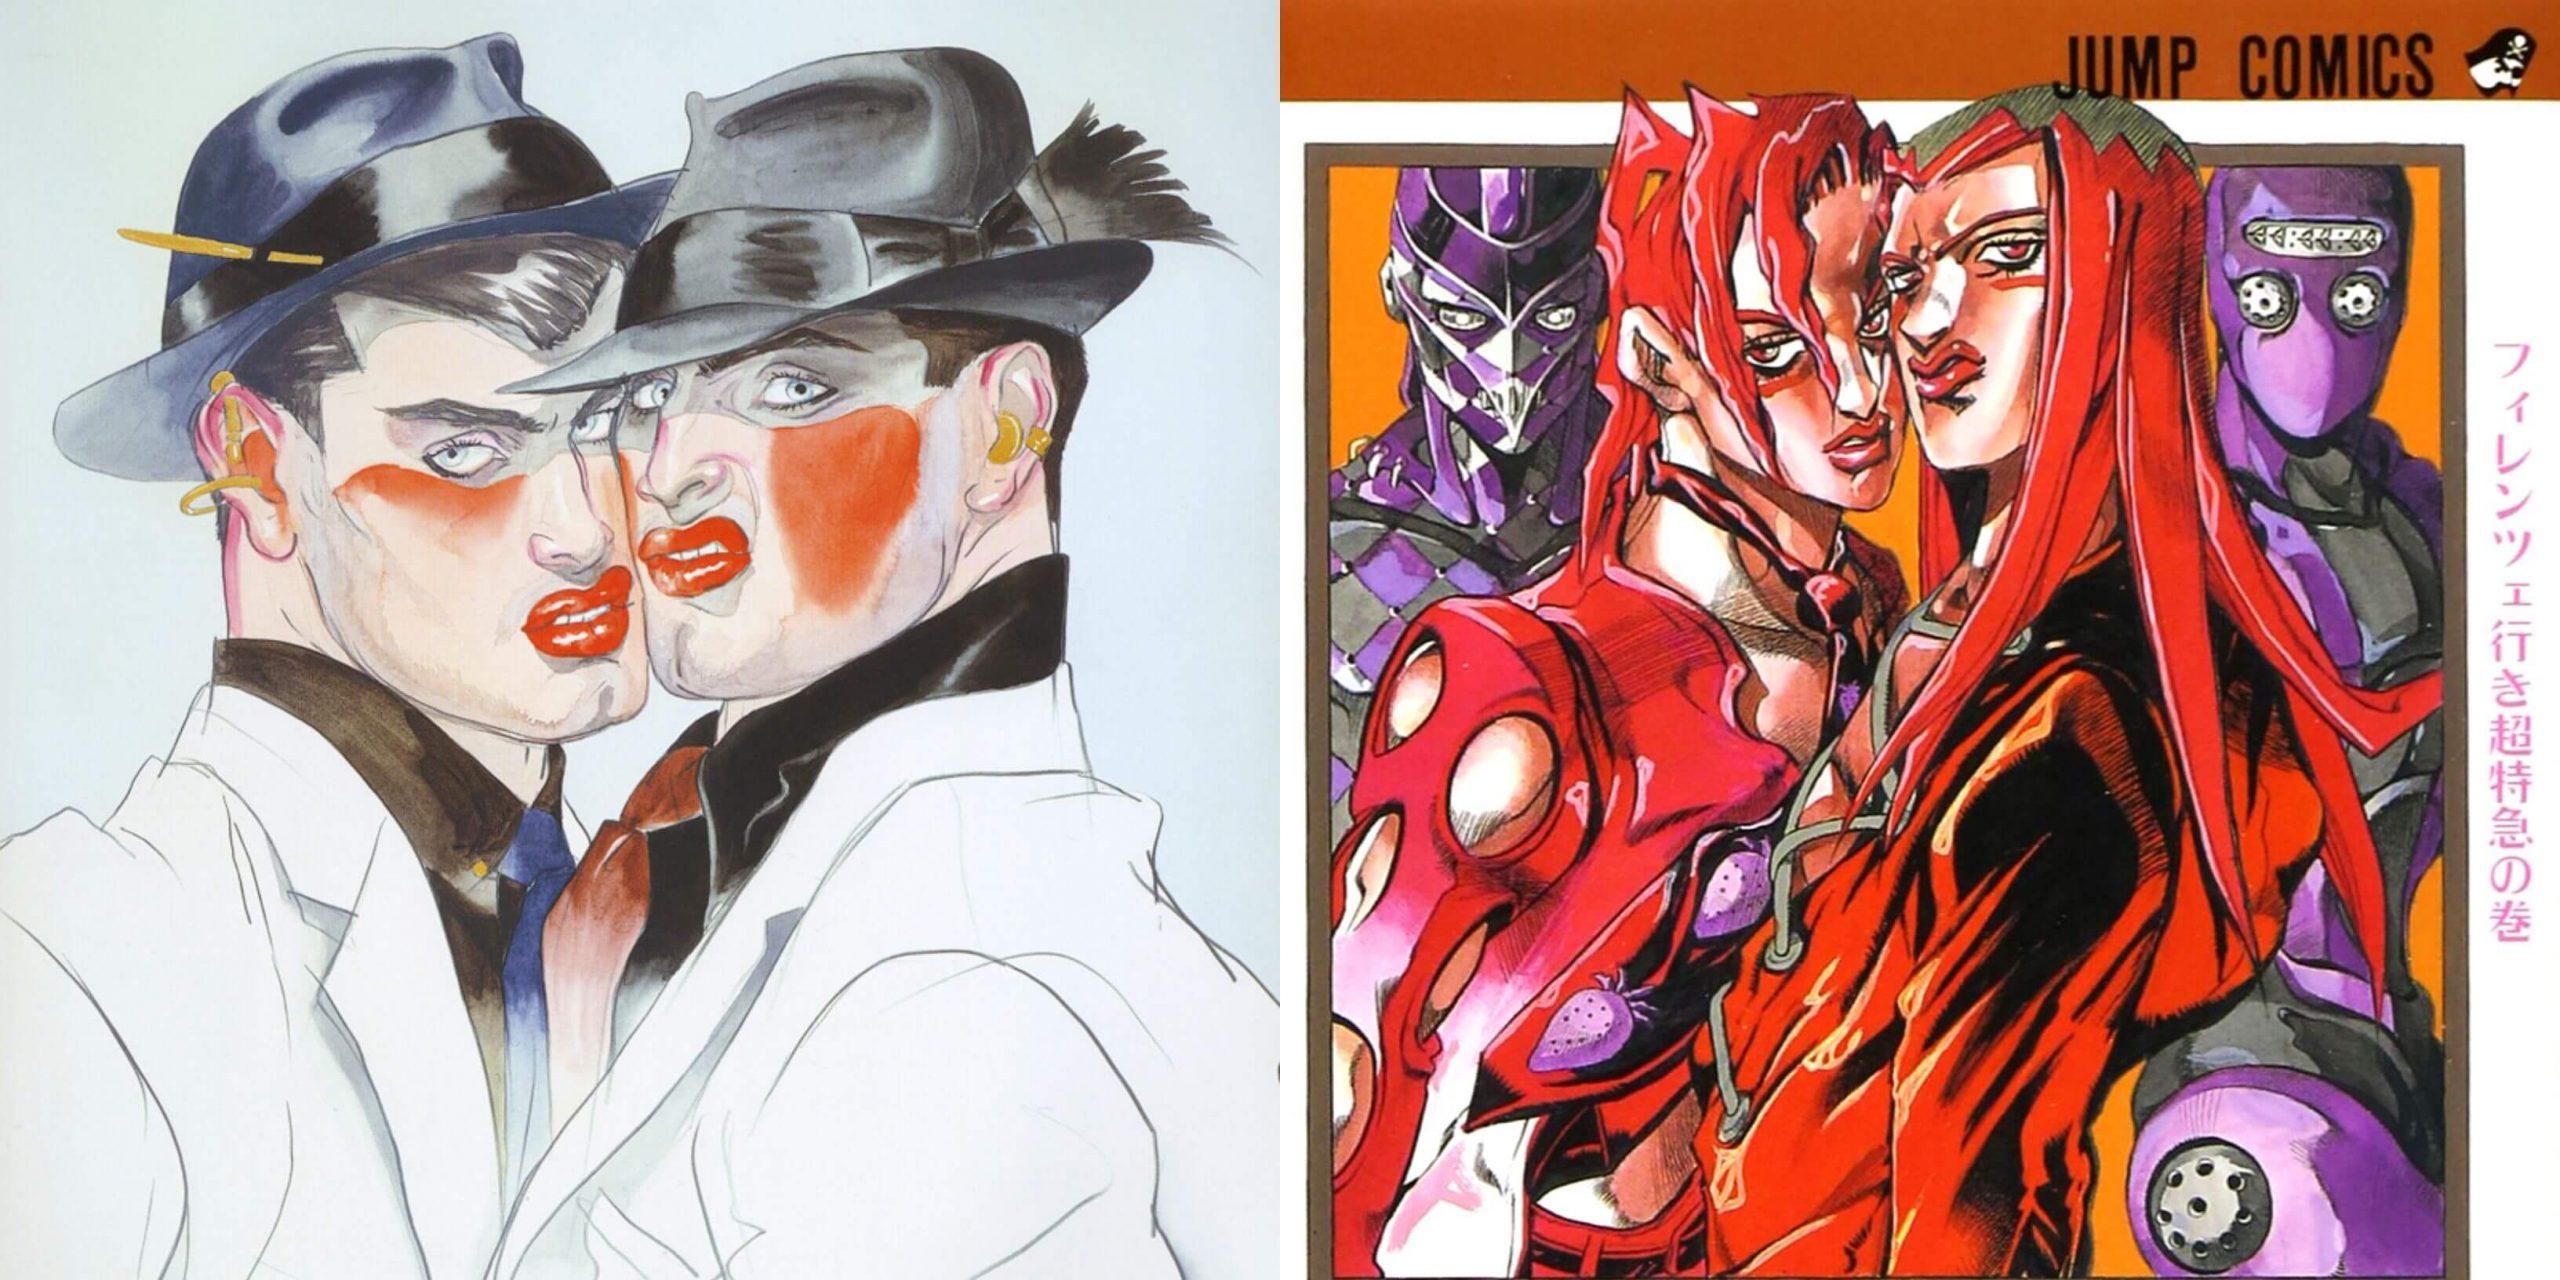 Moda manga Araki arte occidental